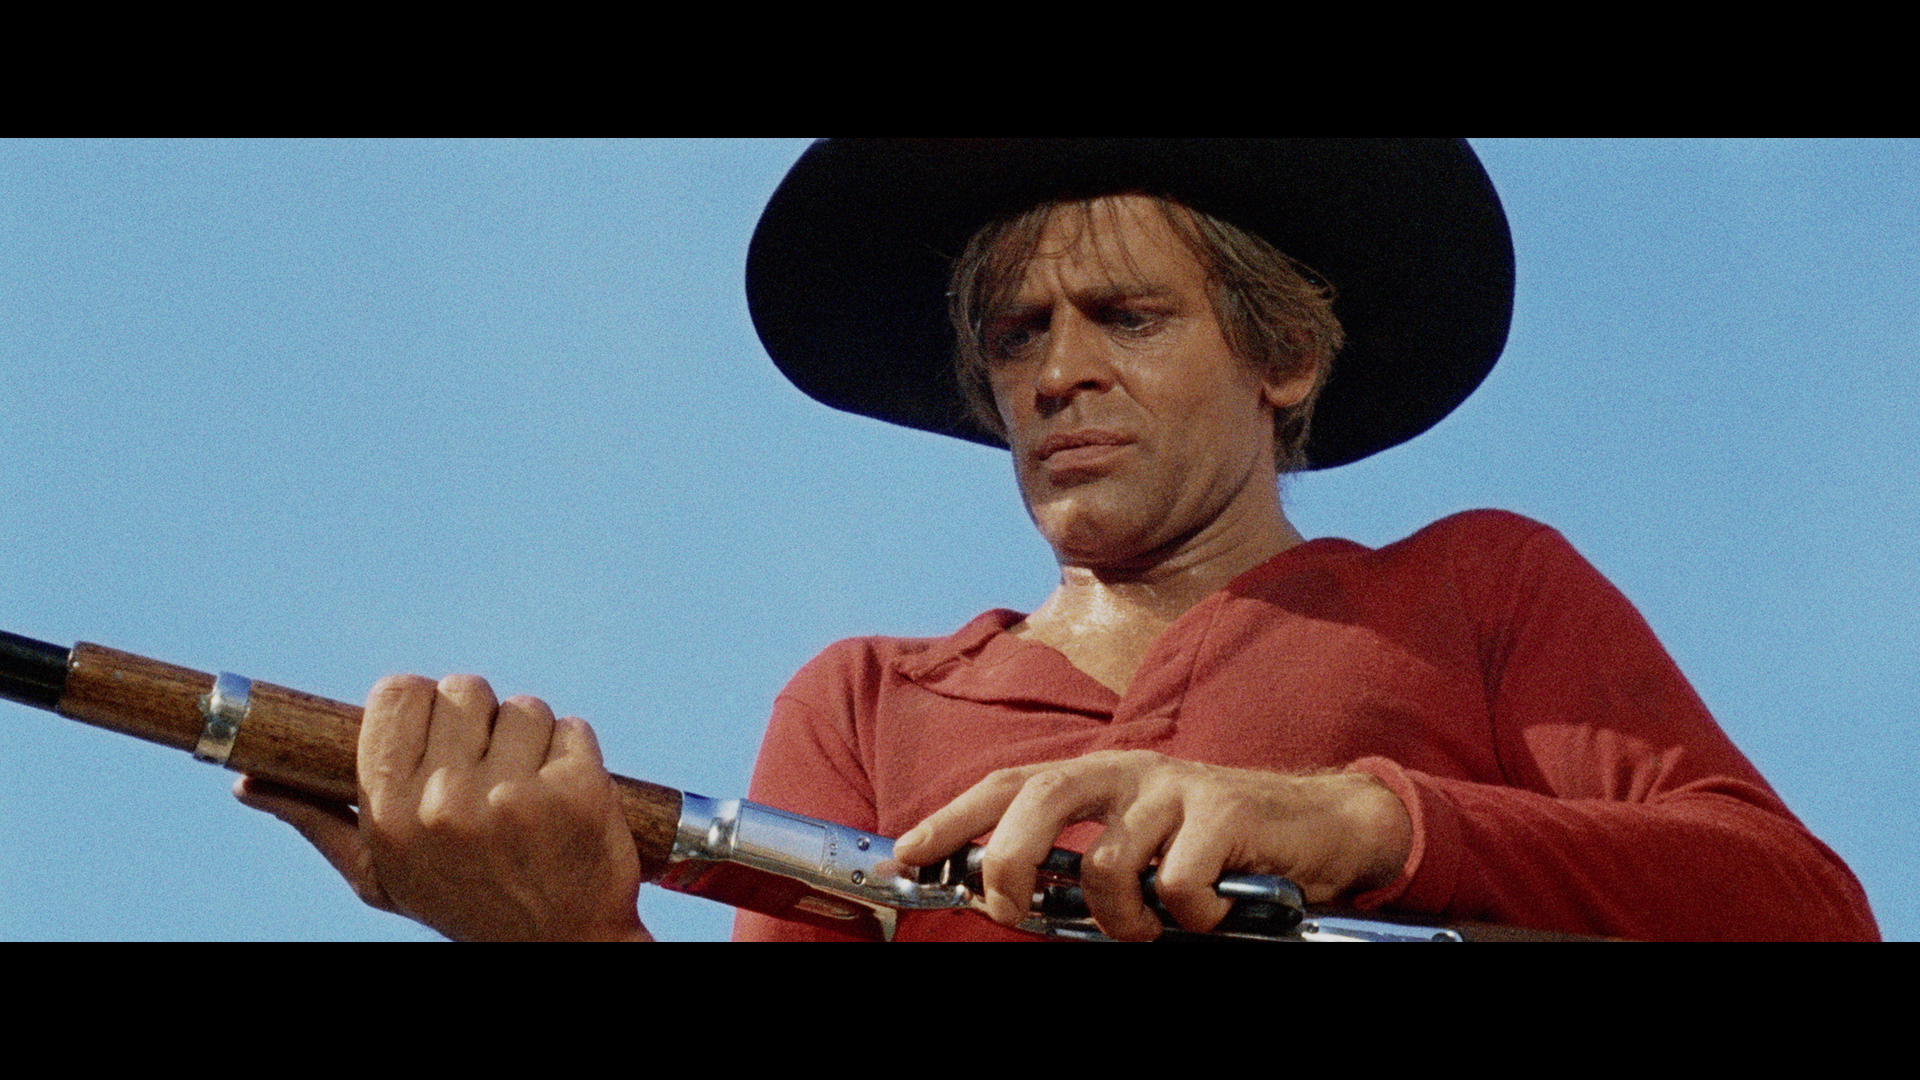 Klaus Kinski in And God Said to Cain (1970)